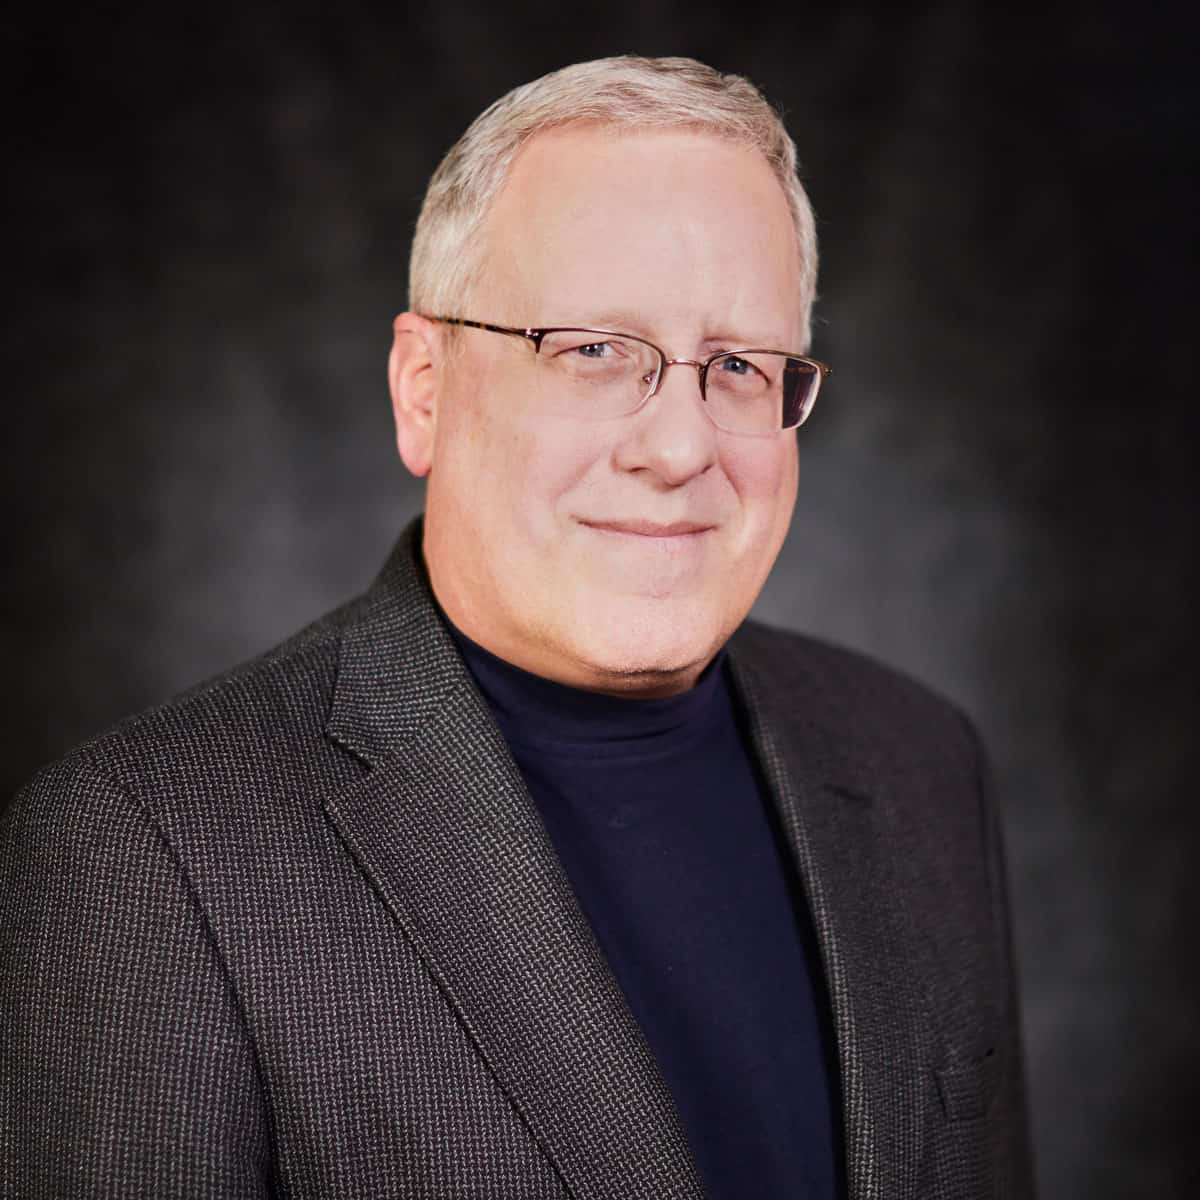 Mark-Zimmerman-photo